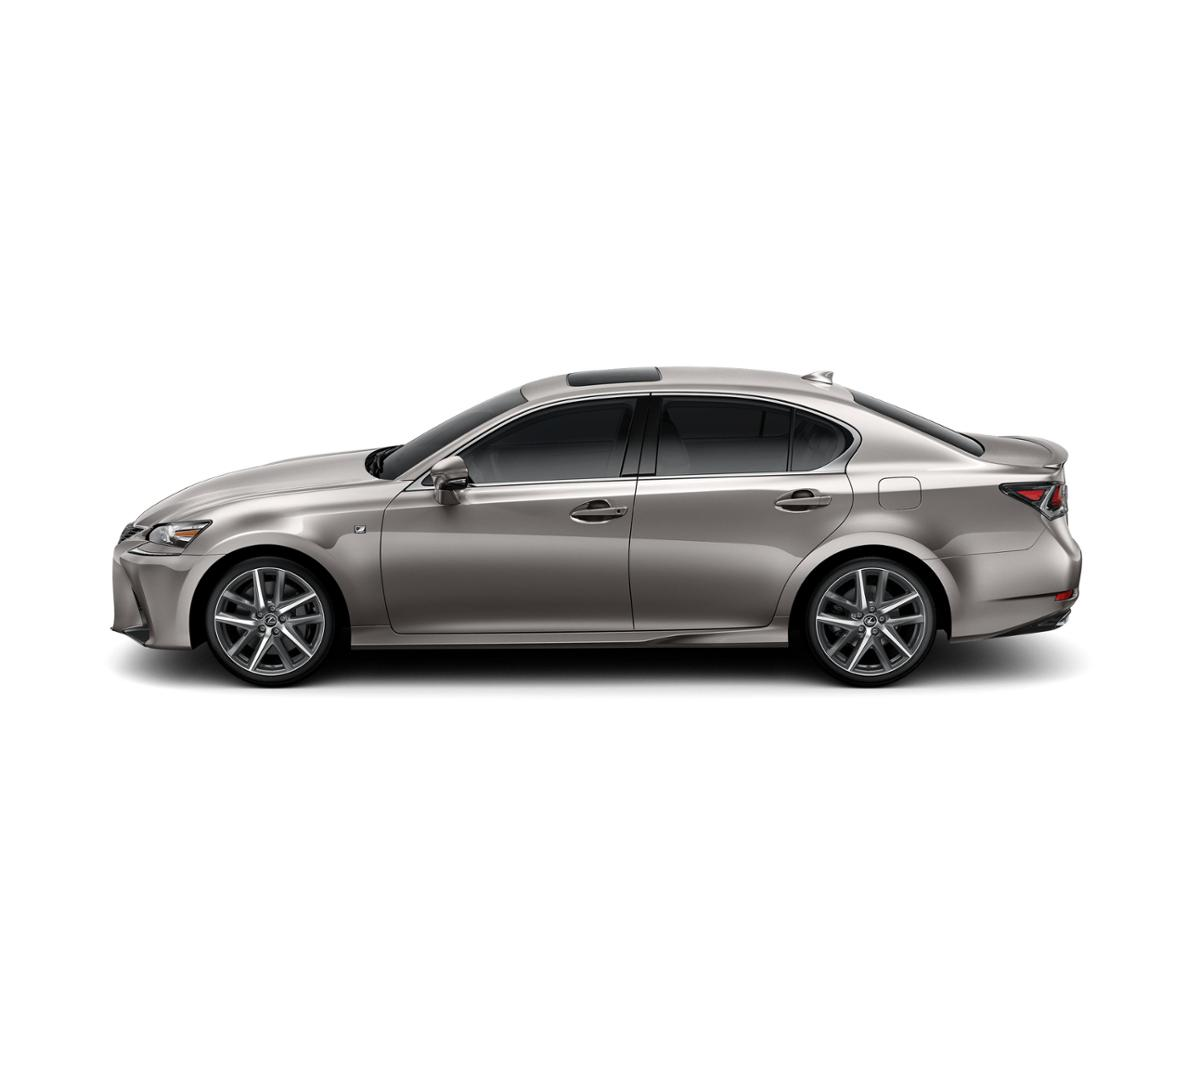 2018 Lexus GS 350 For Sale In Cicero